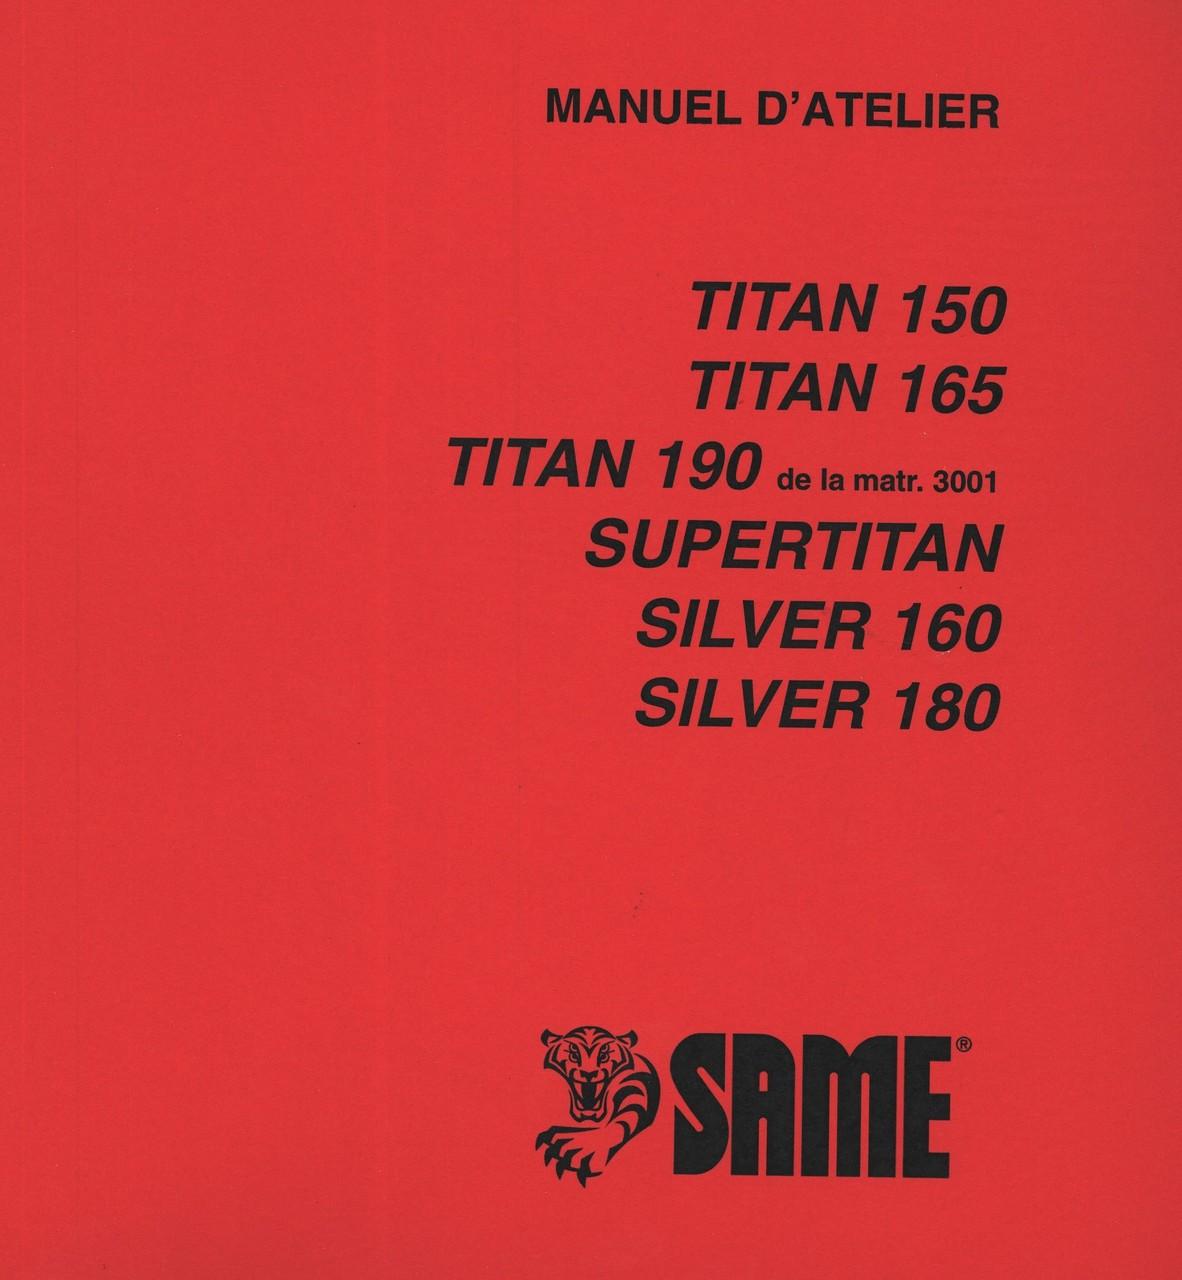 TITAN 150 - TITAN 165 - TITAN 190 de la matr. 3001 - SUPERTITAN - SILVER 160 - SILVER 180 - Manuel d'atelier